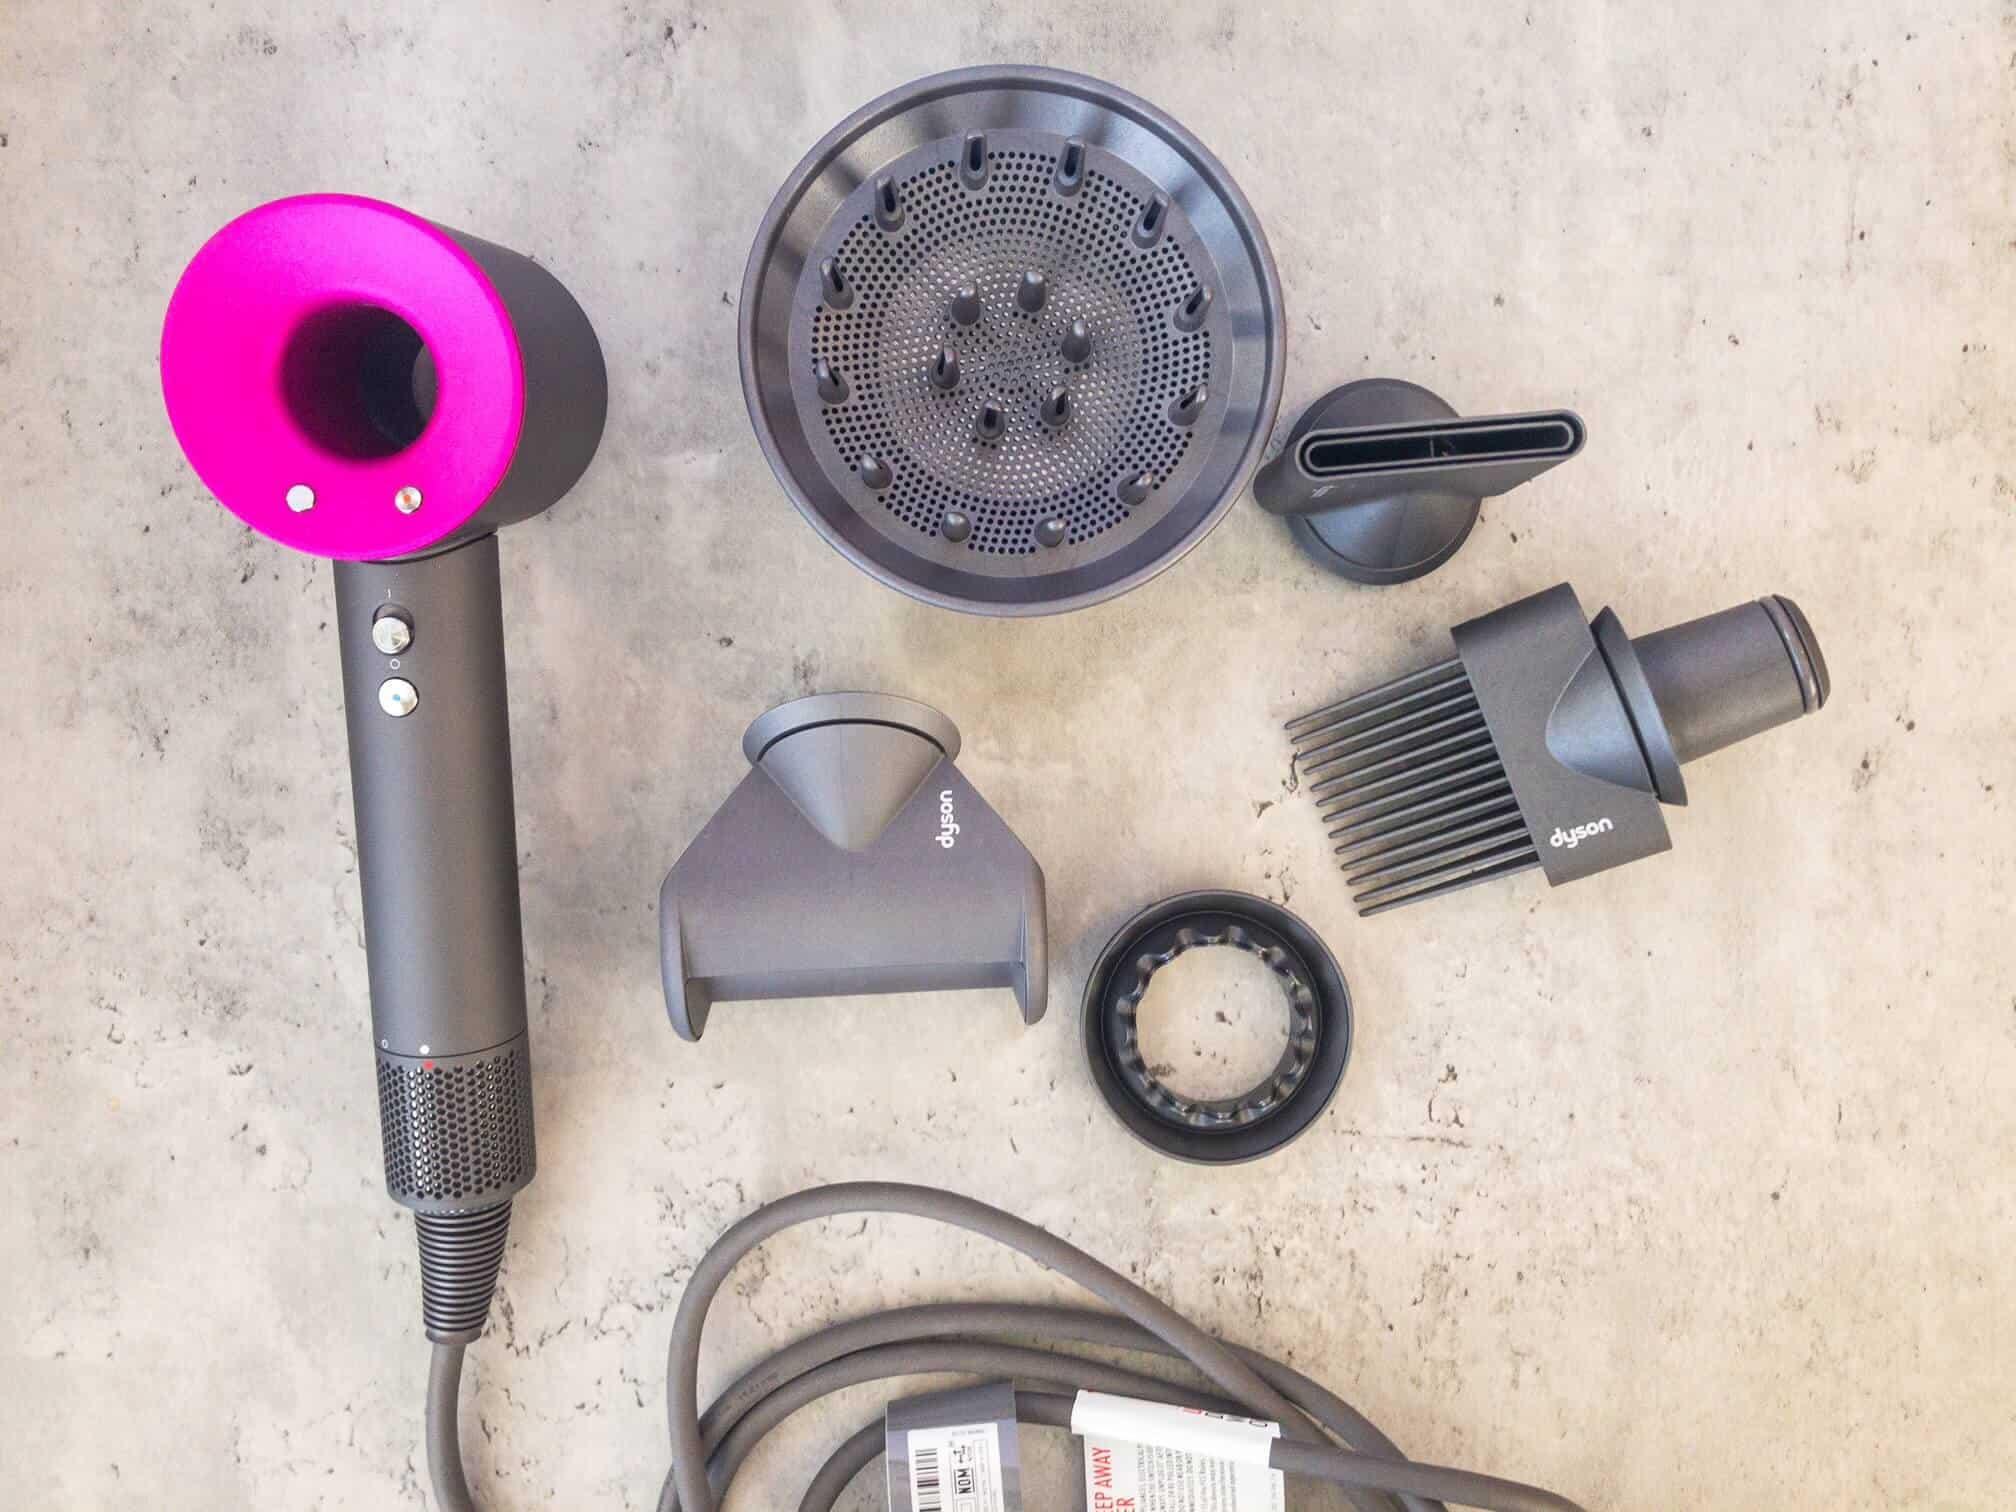 dyson hair dryer review